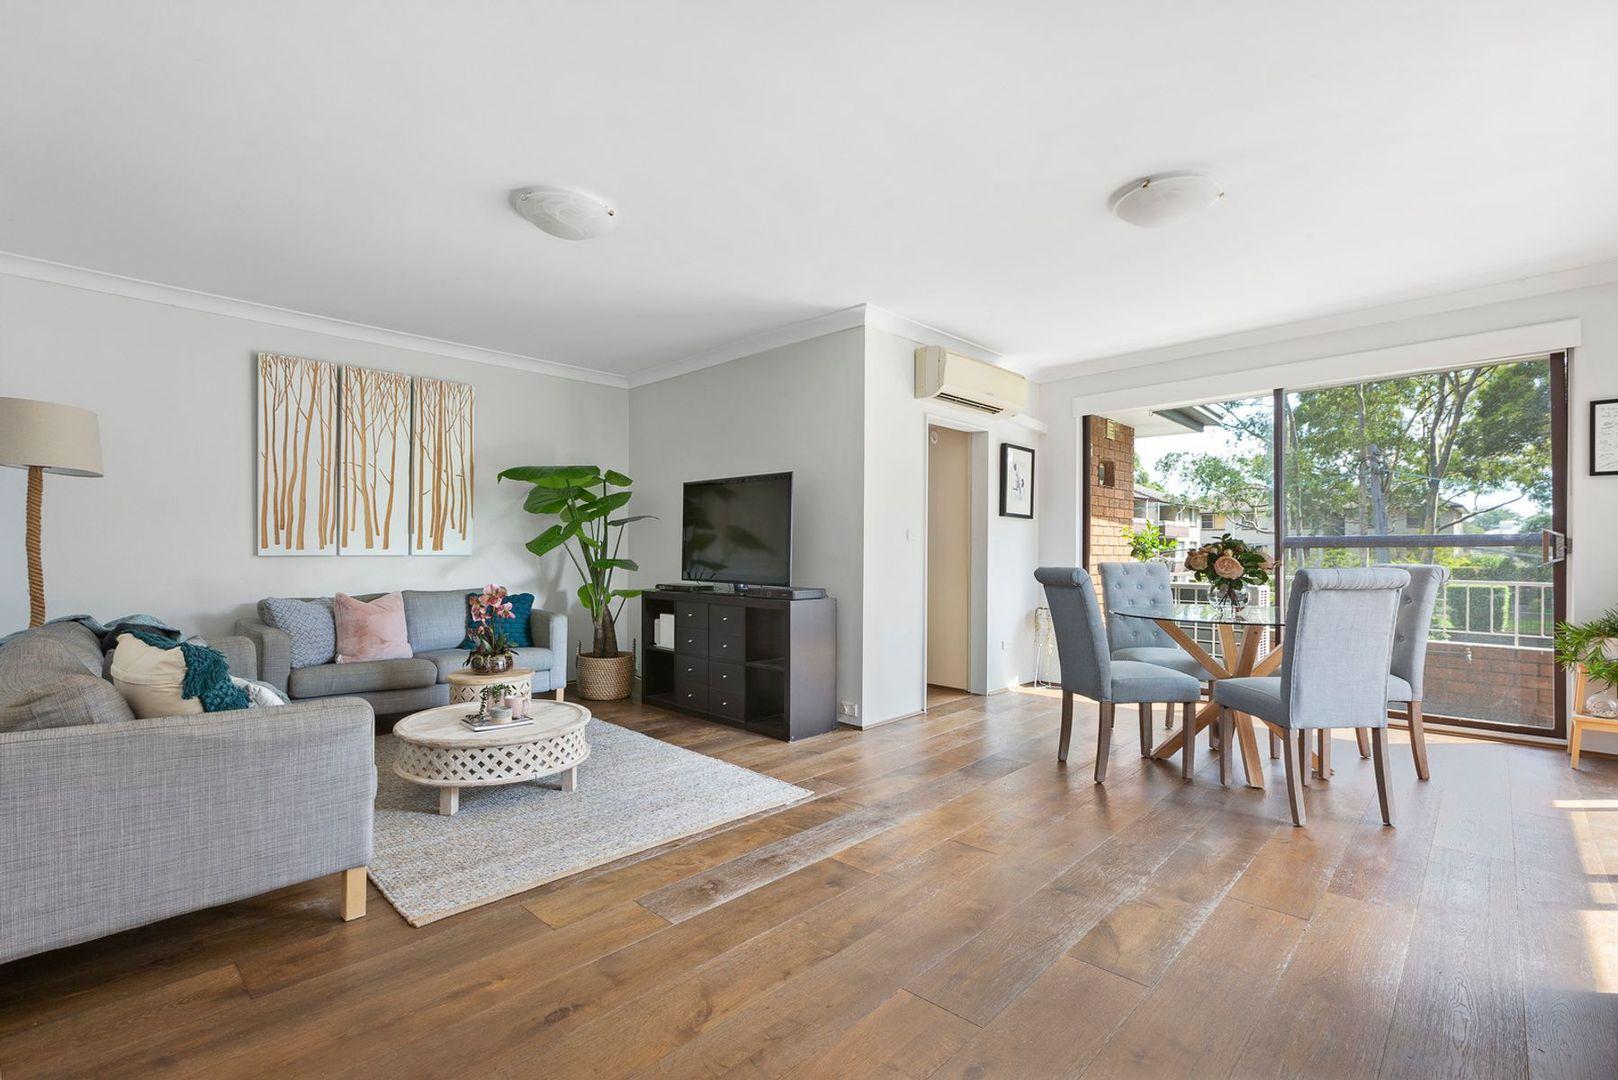 18/6 Benton Avenue, Artarmon NSW 2064, Image 0